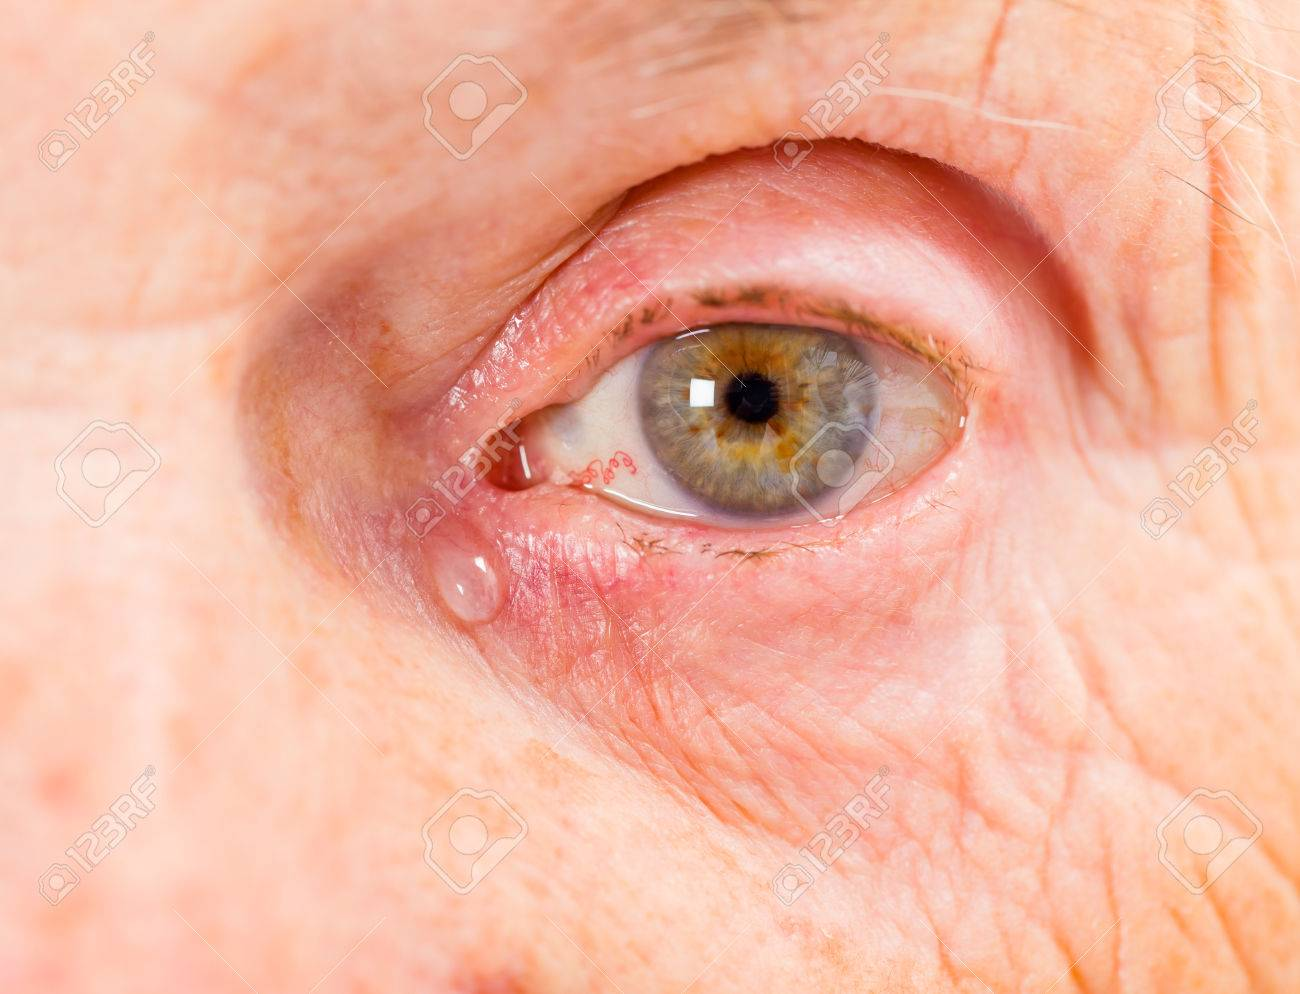 Close up photo of elderly woman eye Standard-Bild - 37849047